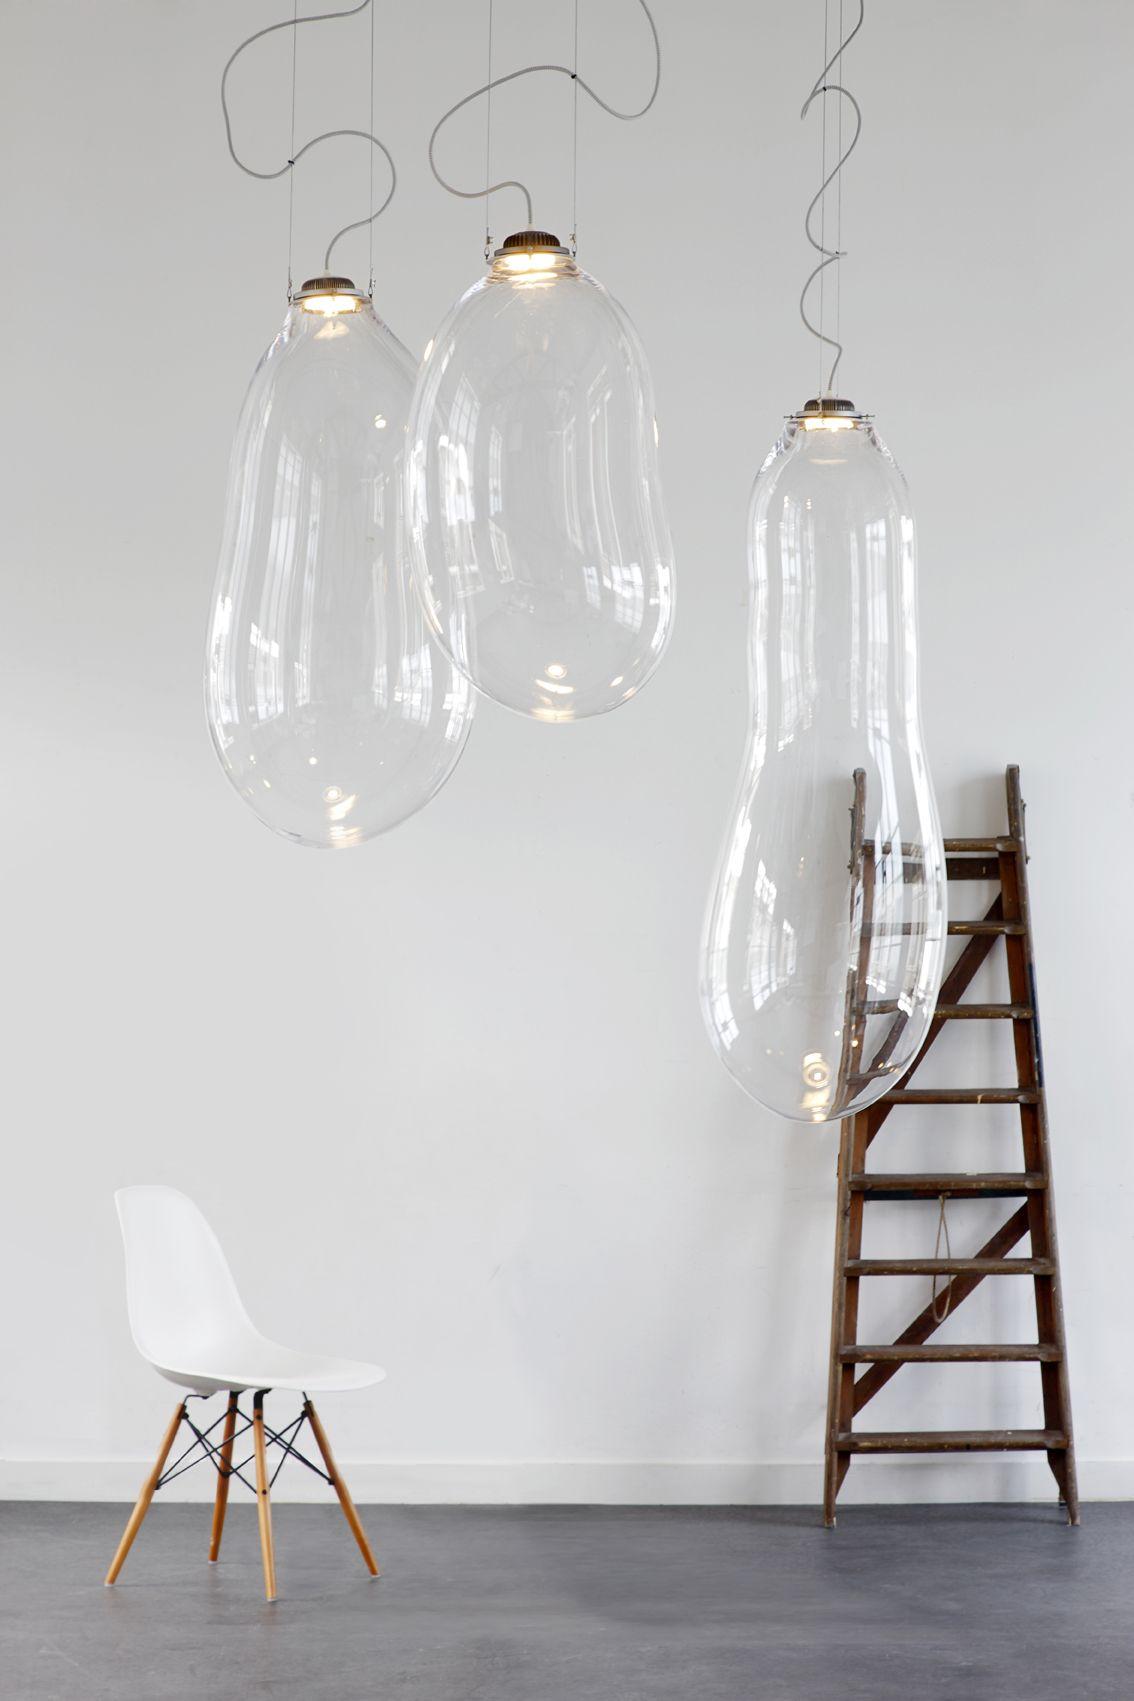 Postmodern Chandeliers Ceiling Nordic Luminaires Deco Lighting Glass Fixtures Living Room Hanging Lights Bedroom Pendant Lamps Pure And Mild Flavor Ceiling Lights & Fans Chandeliers